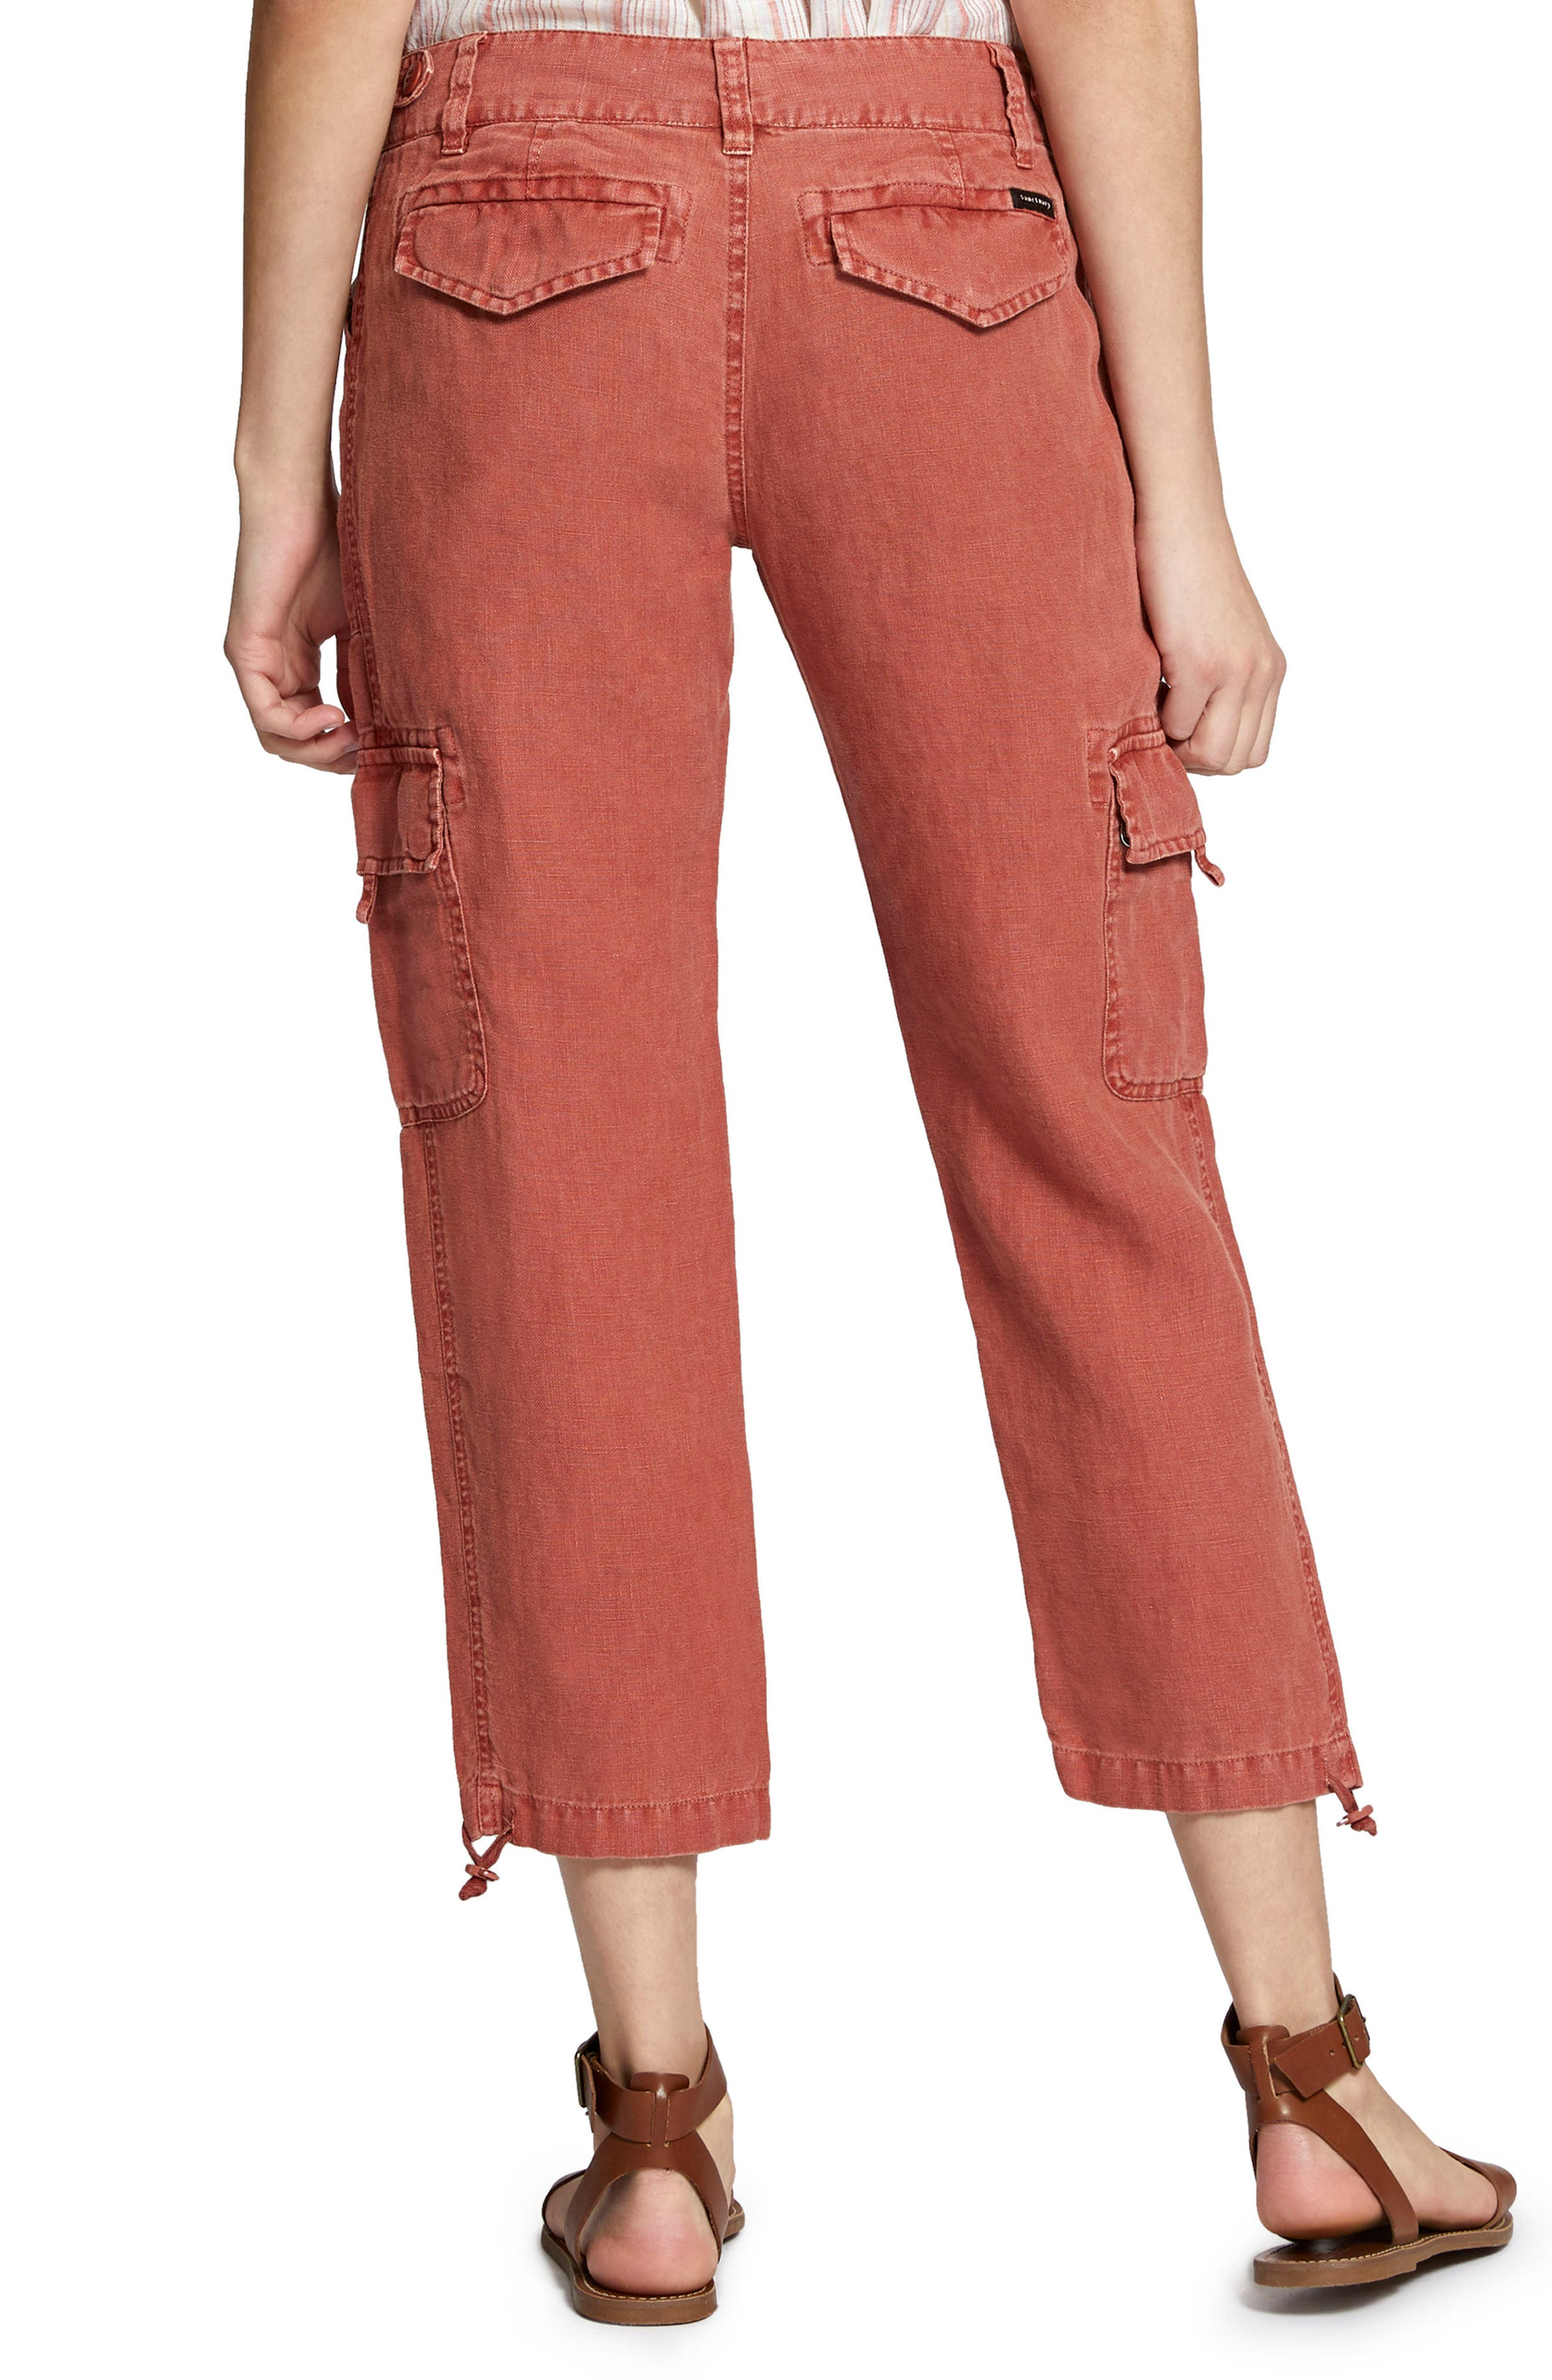 Terrain Linen Crop Cargo Pants,                             Alternate thumbnail 2, color,                             Terra Cotta